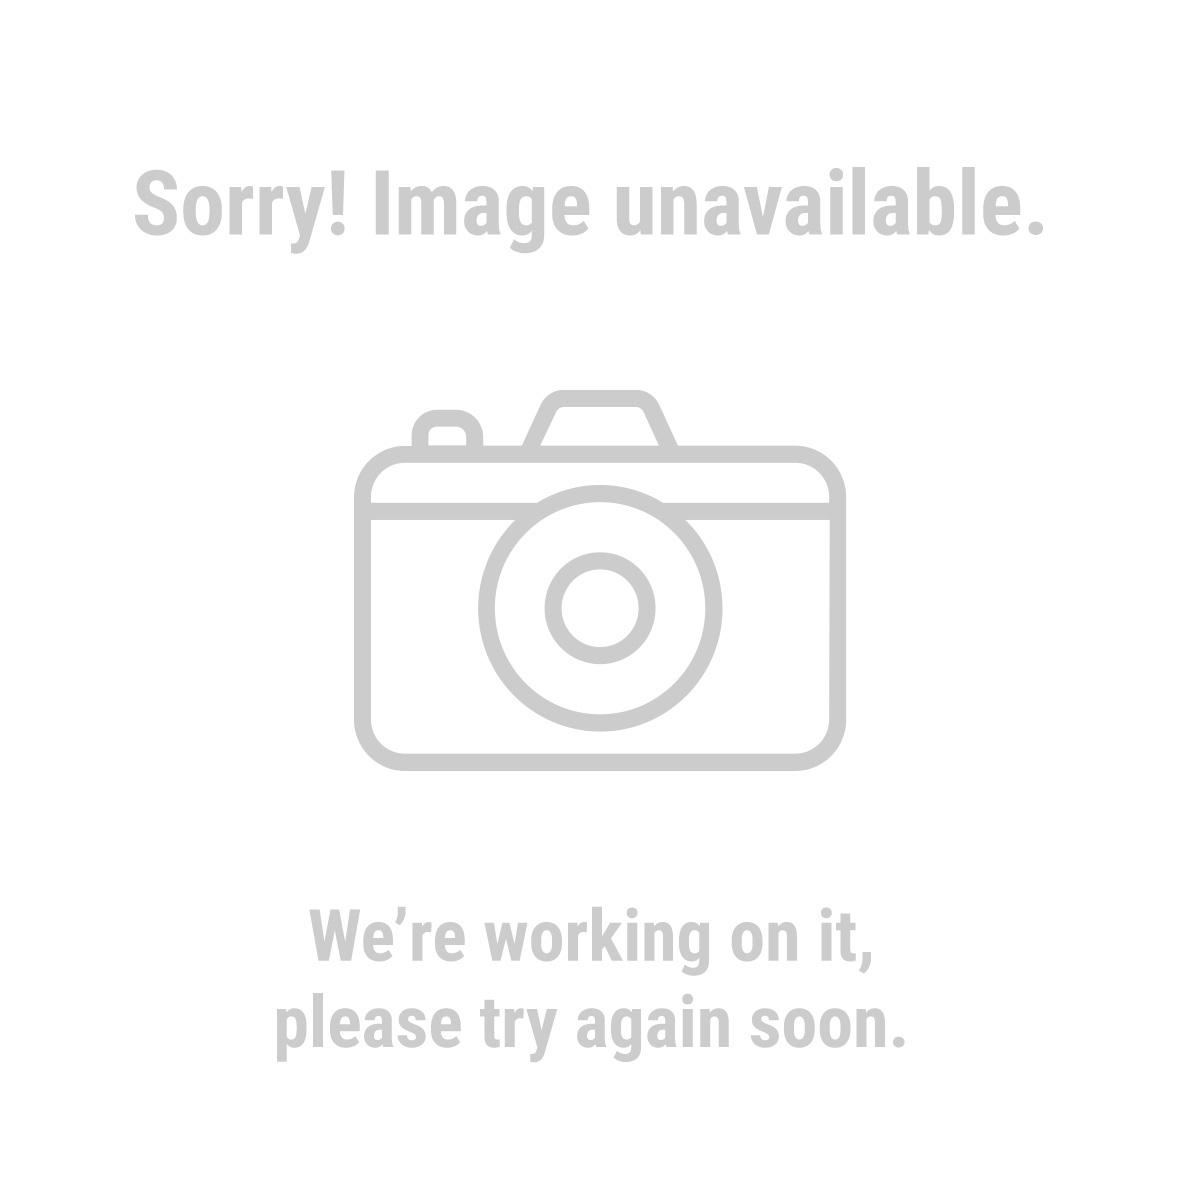 Maddox 63264 Disc Brake Pad and Caliper Service Tool Kit 11 Pc